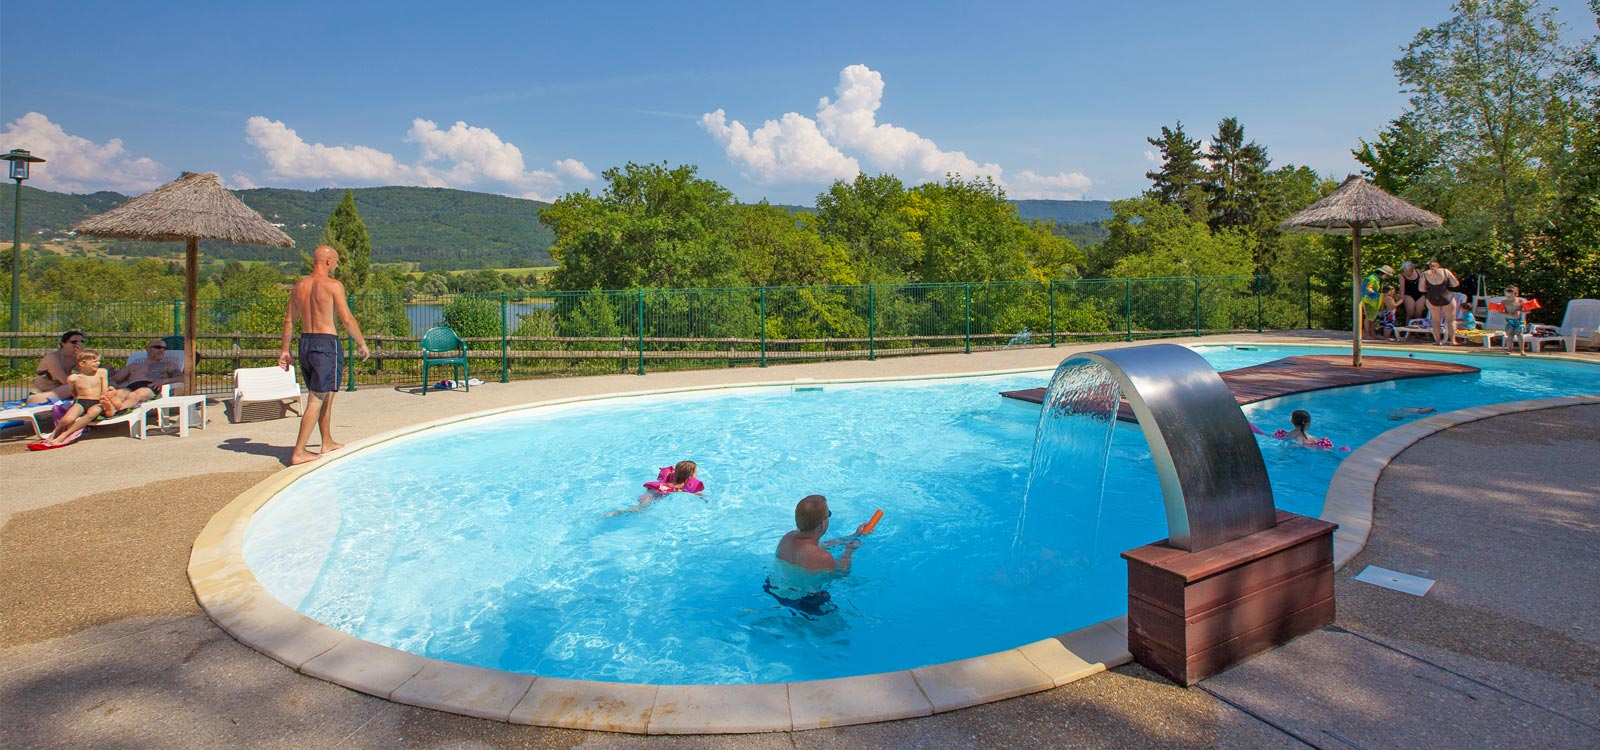 Camping dans l ain avec piscine camping c t d 39 un lac for Camping dans les vosges avec piscine